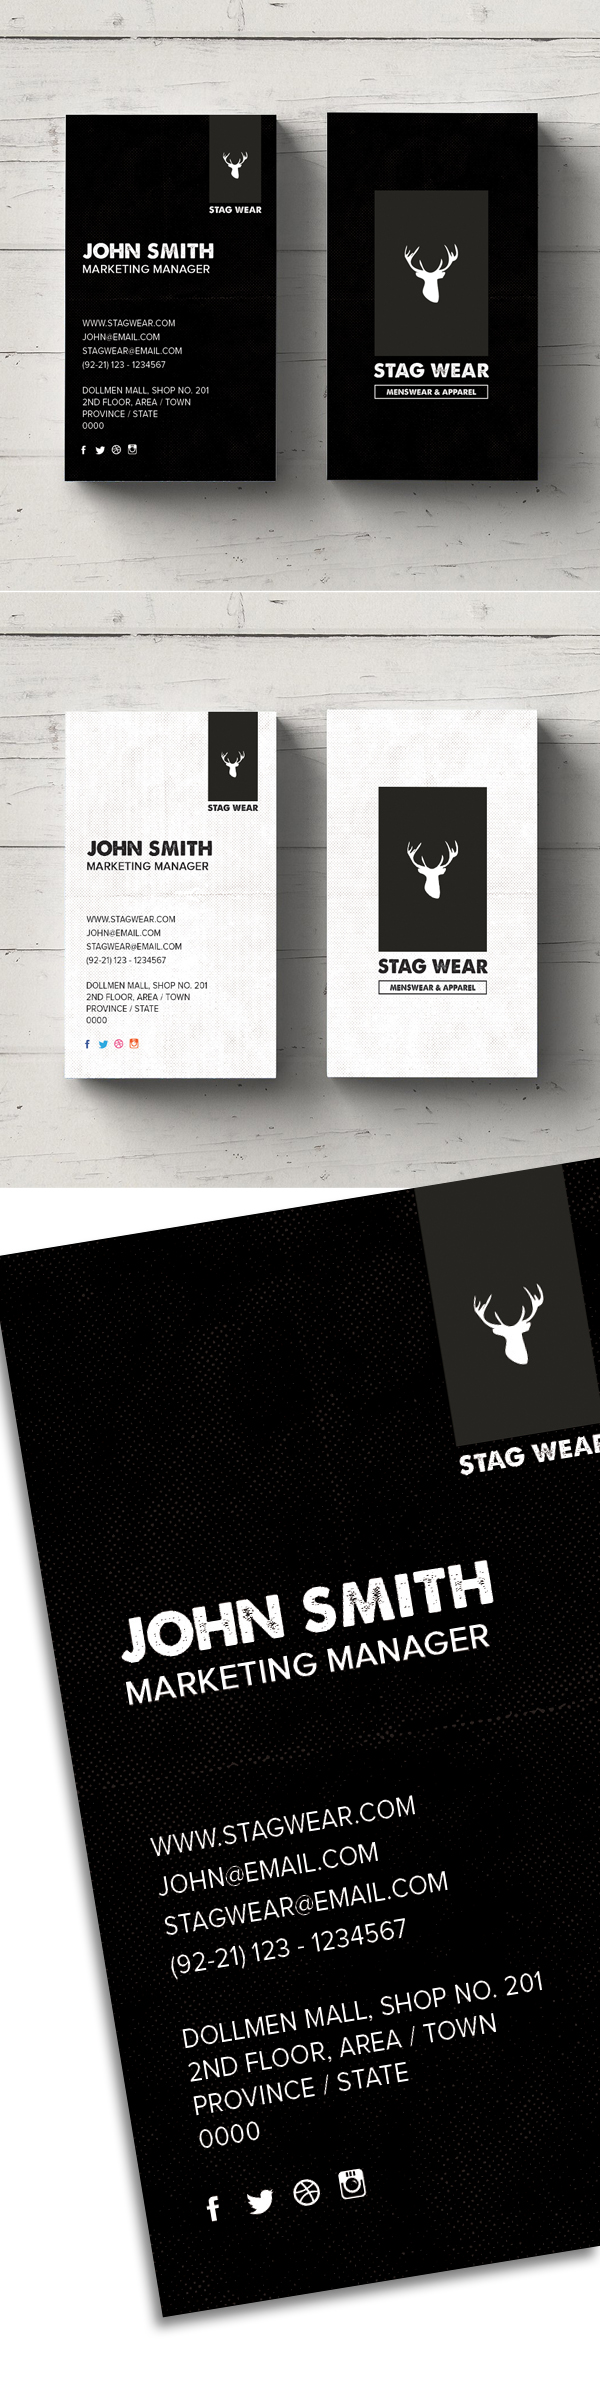 Free Vertical Business Card PSD Template